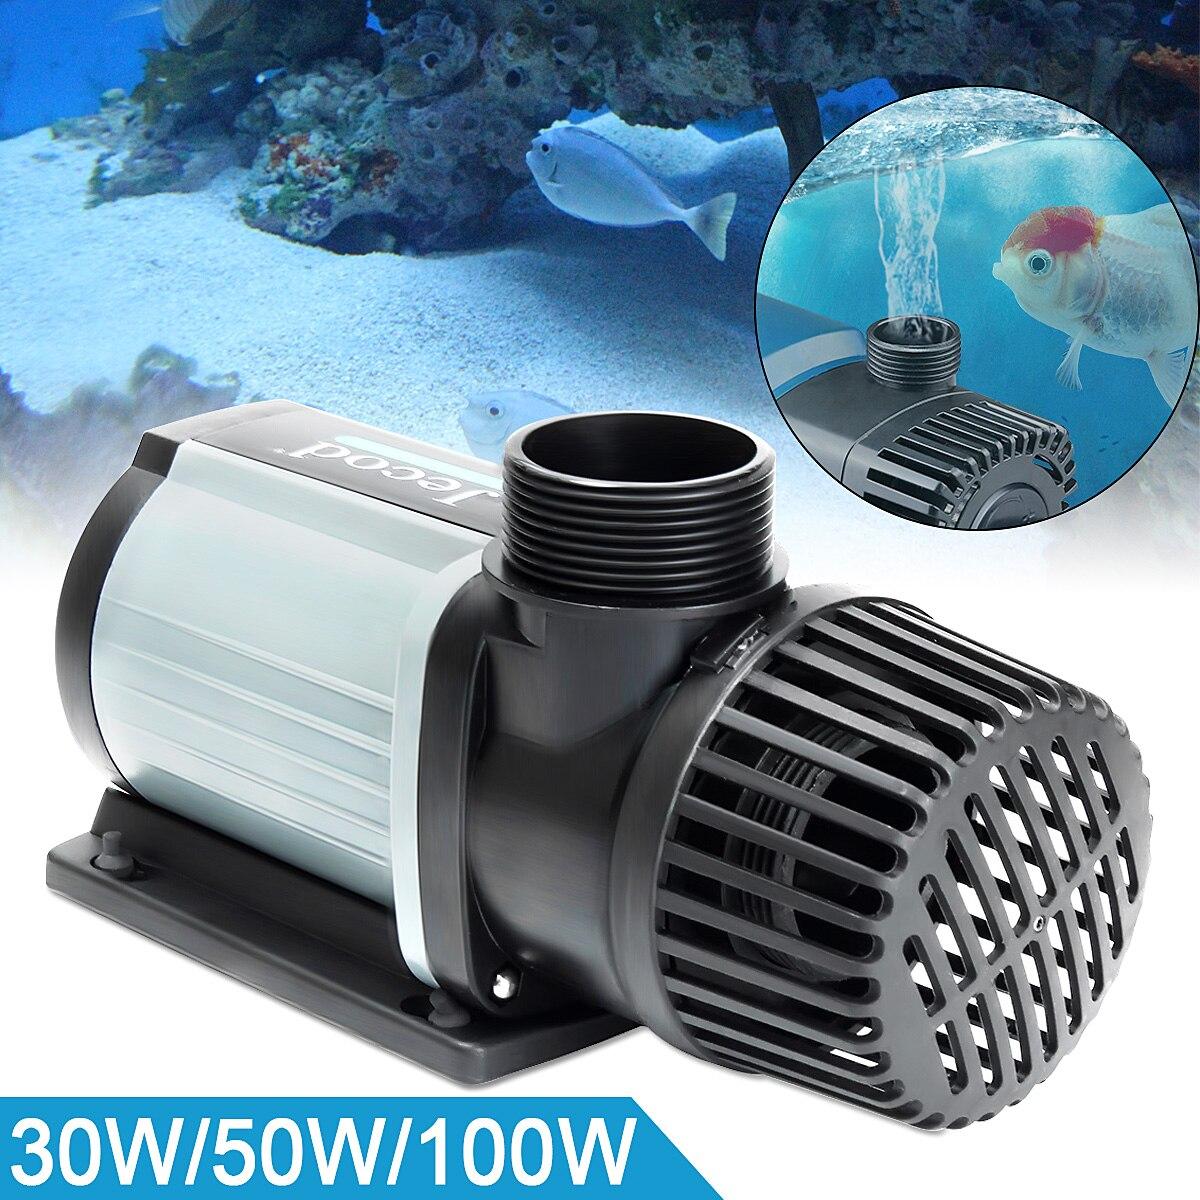 30/50/100W DC Marine Aquarium Pump Submersible 3000L Super Quiet Operation Variable Flow Controller DCS  2000-12000 with Adapter